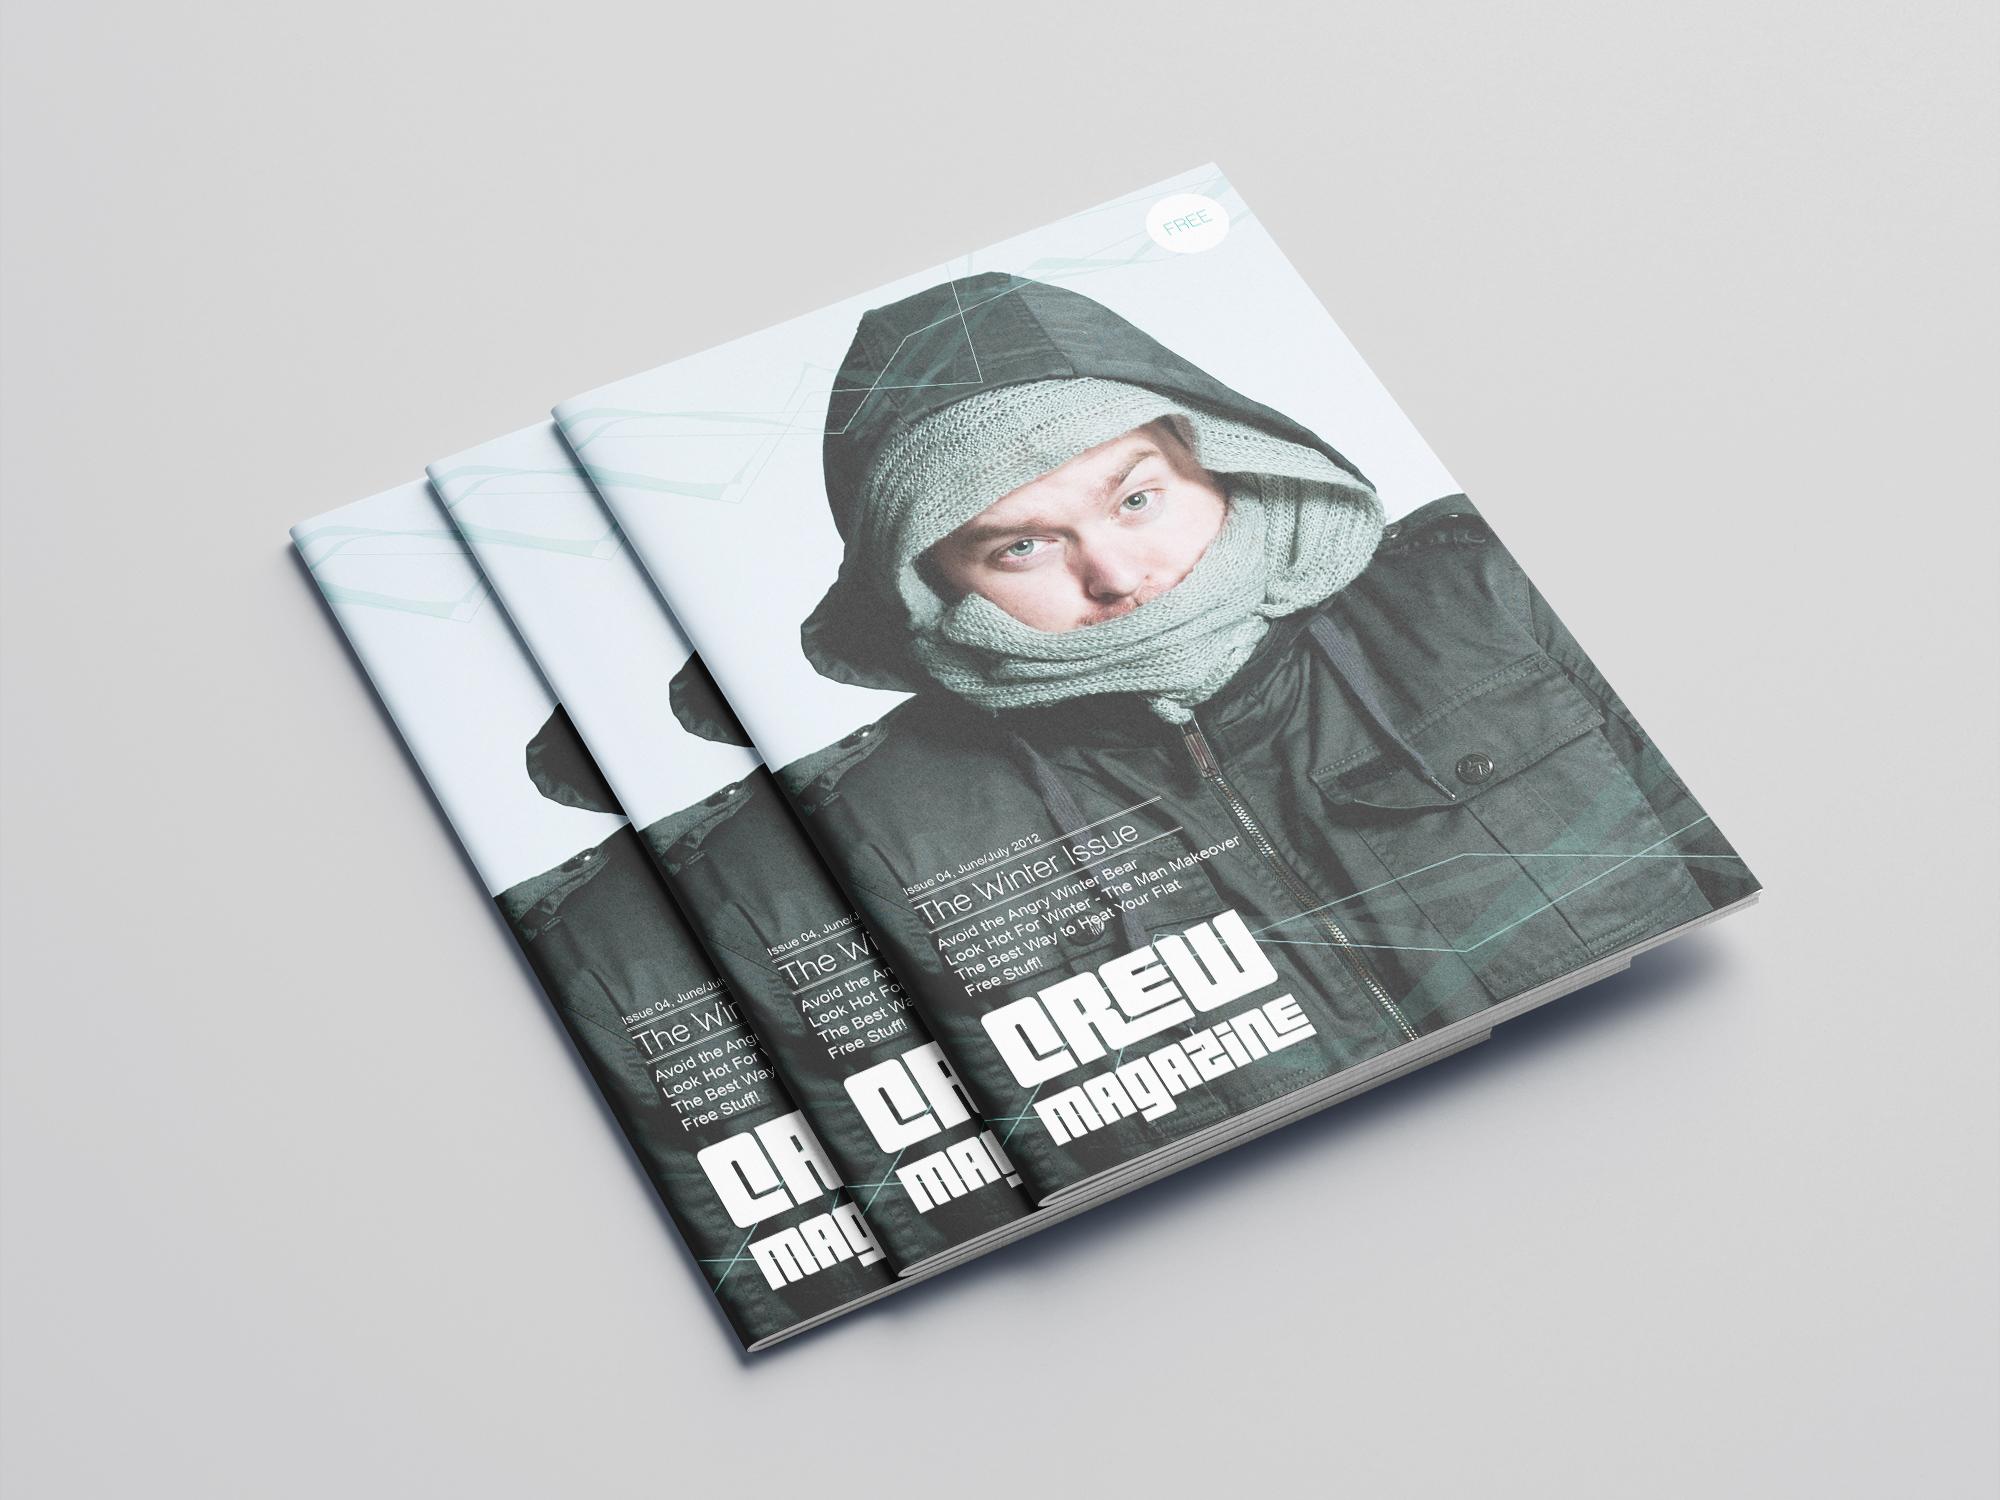 Crew-winter-2012-cover.jpg